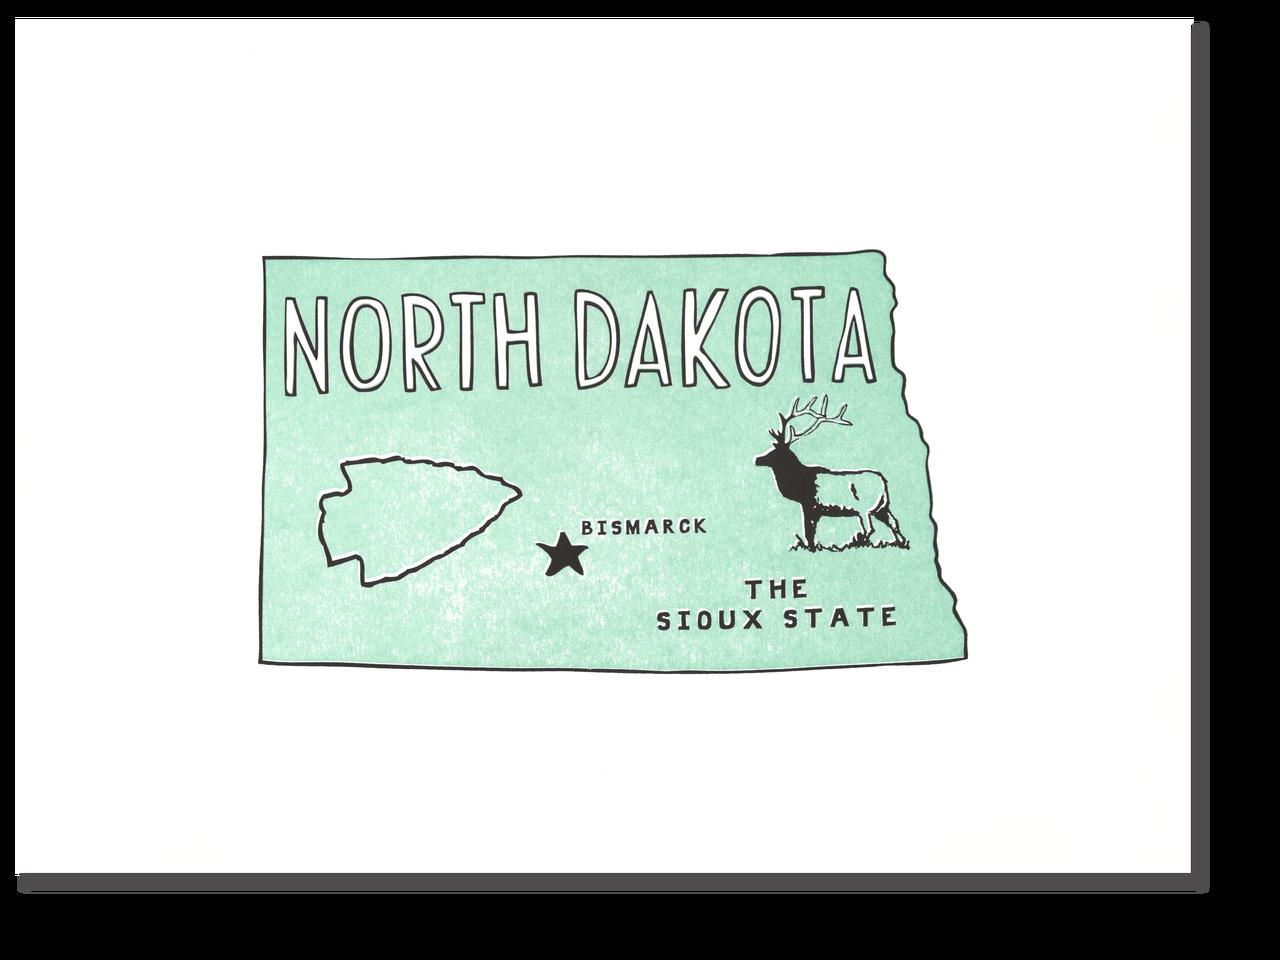 North Dakota State Print: The Sioux State